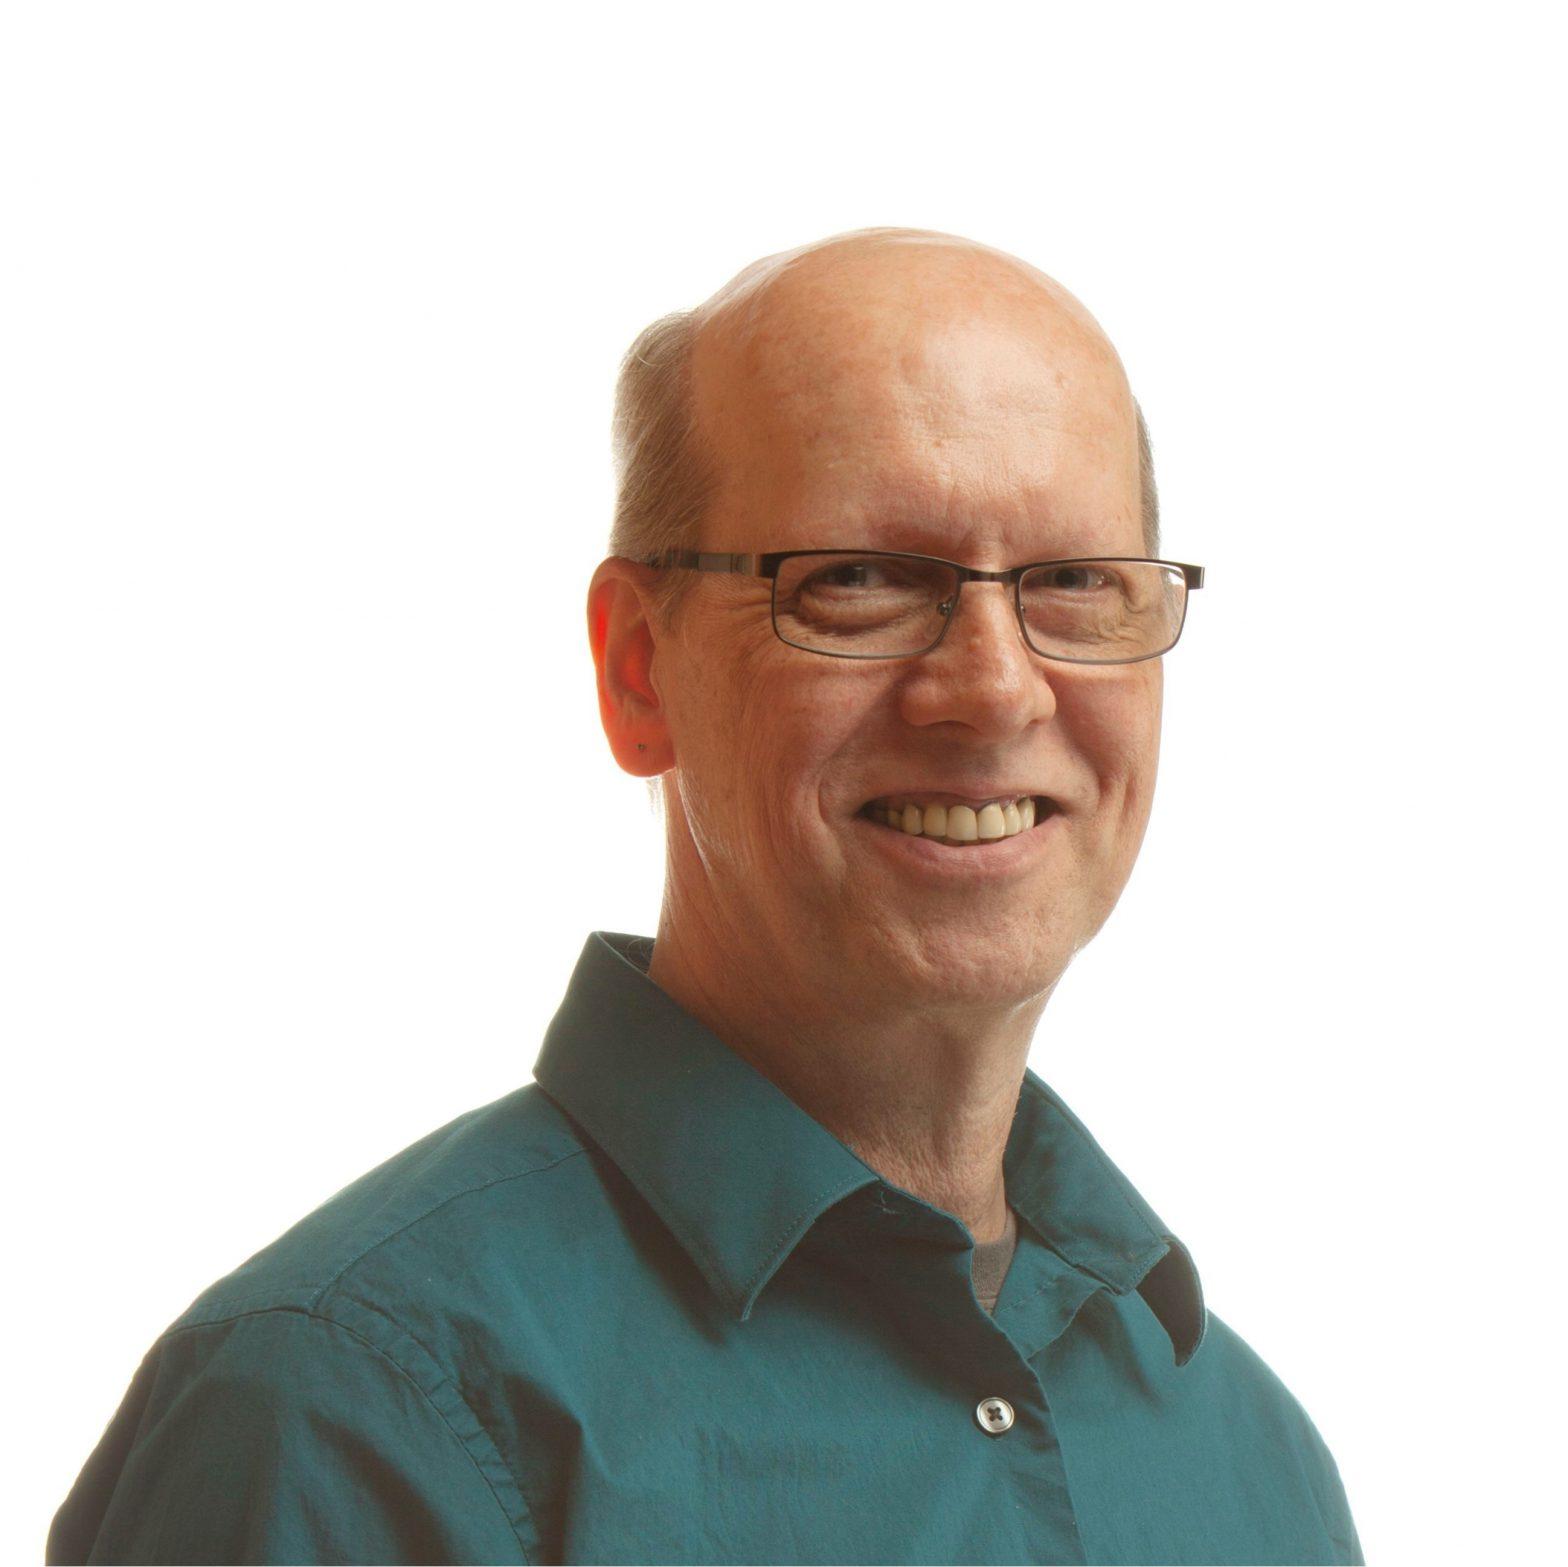 IntelliTect employee Tom Faust